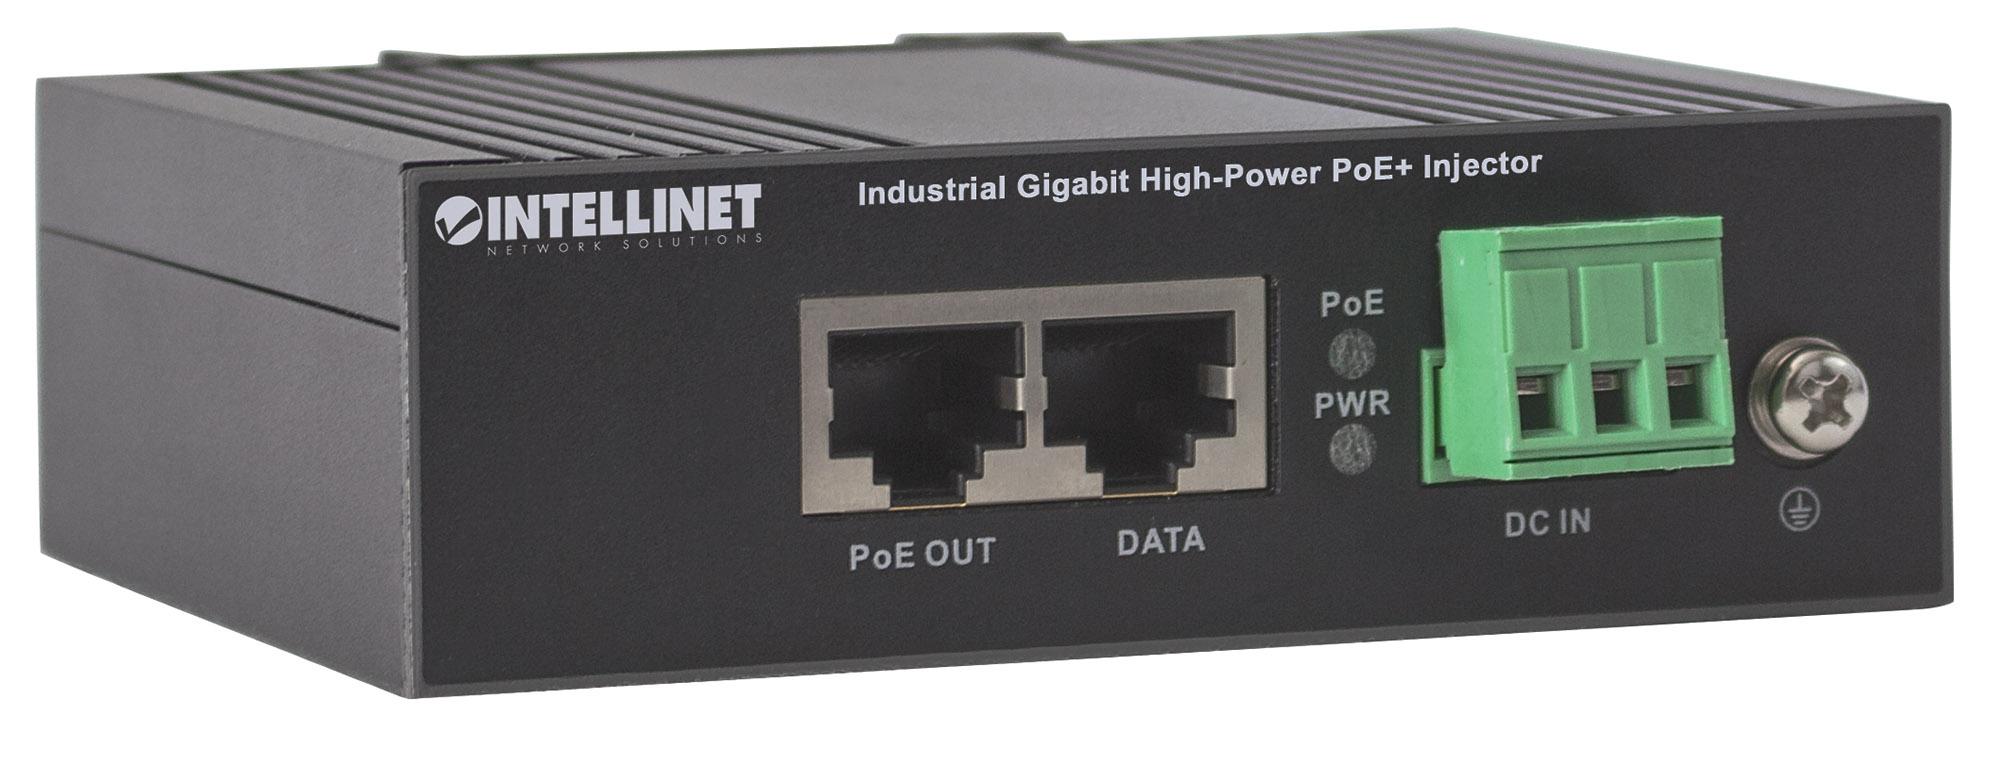 Industrial Gigabit High-Power PoE+ Injector